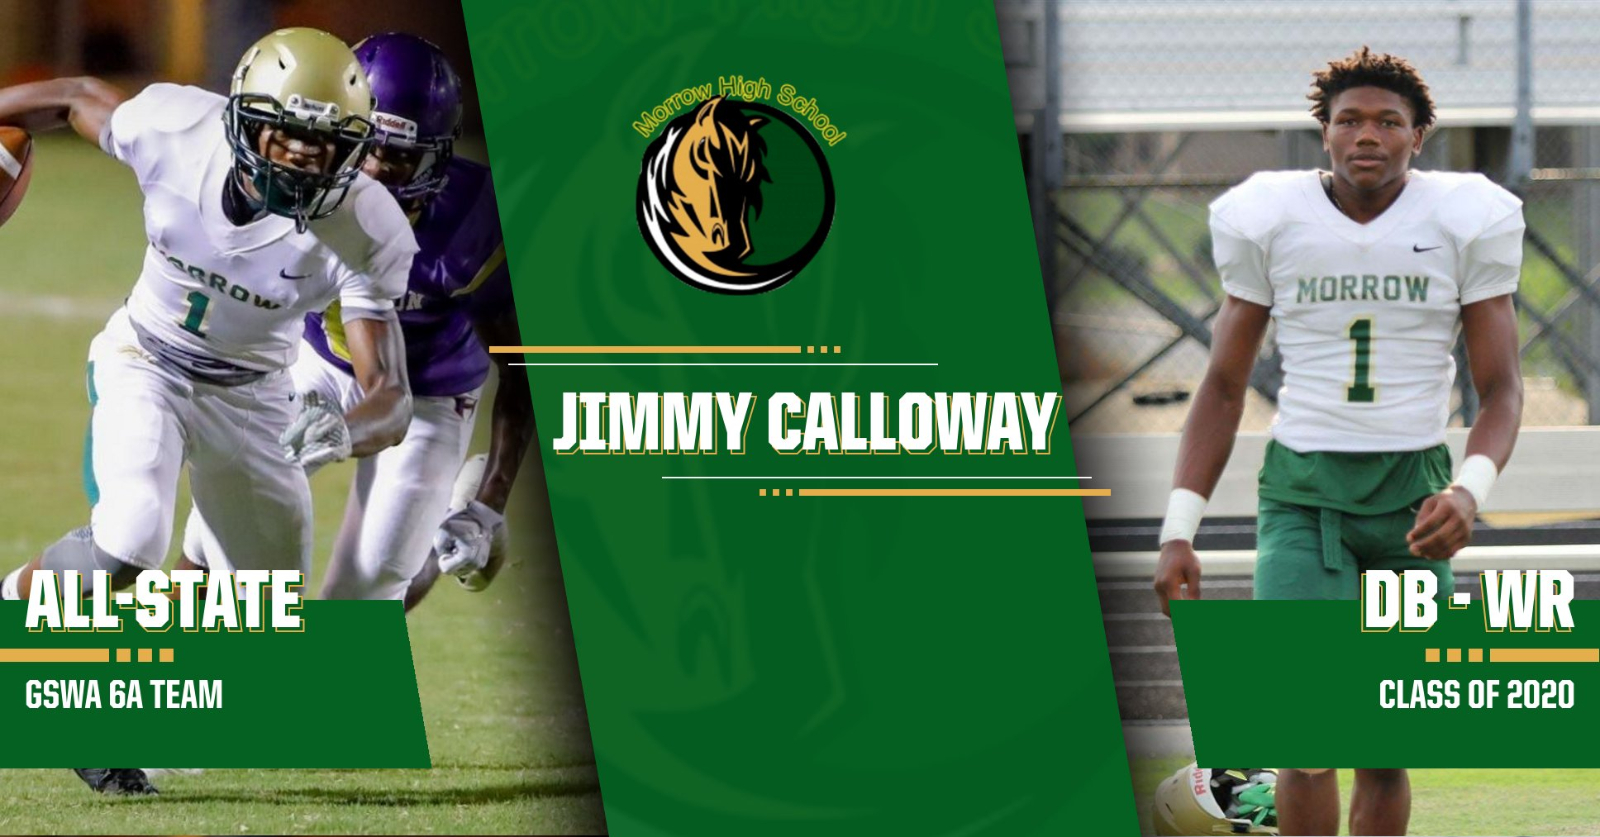 GSWA Honors Jimmy Calloway